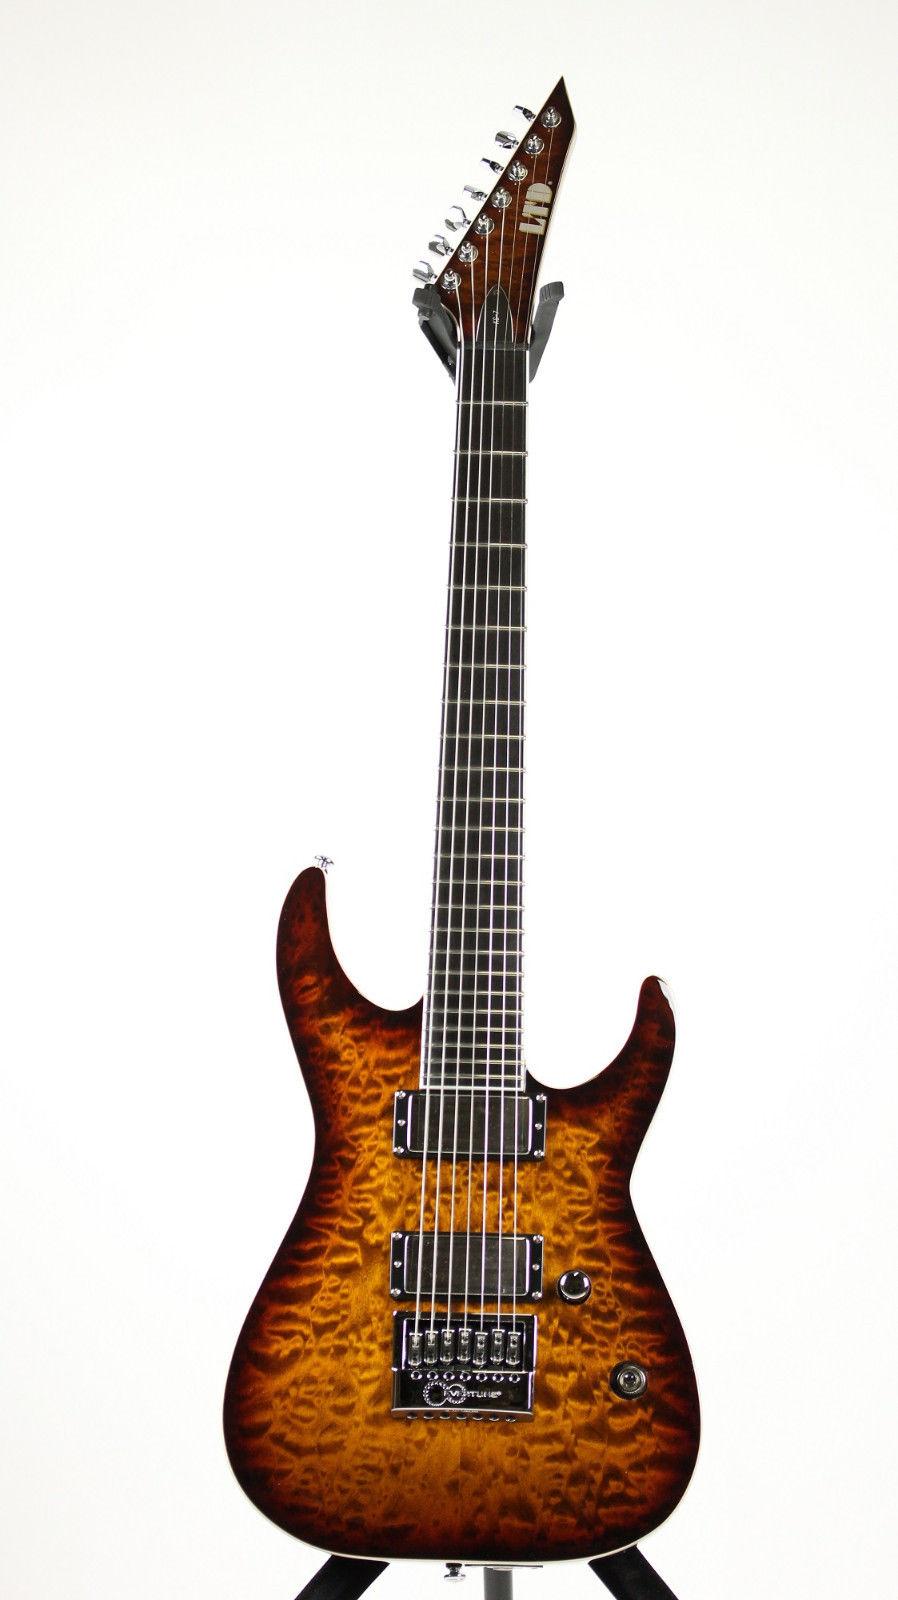 ESP LKS7QMETDBSB LTD Ken Susi Signature Quilted Maple Top Electric Guitar with Dark Brown Sunburst Finish